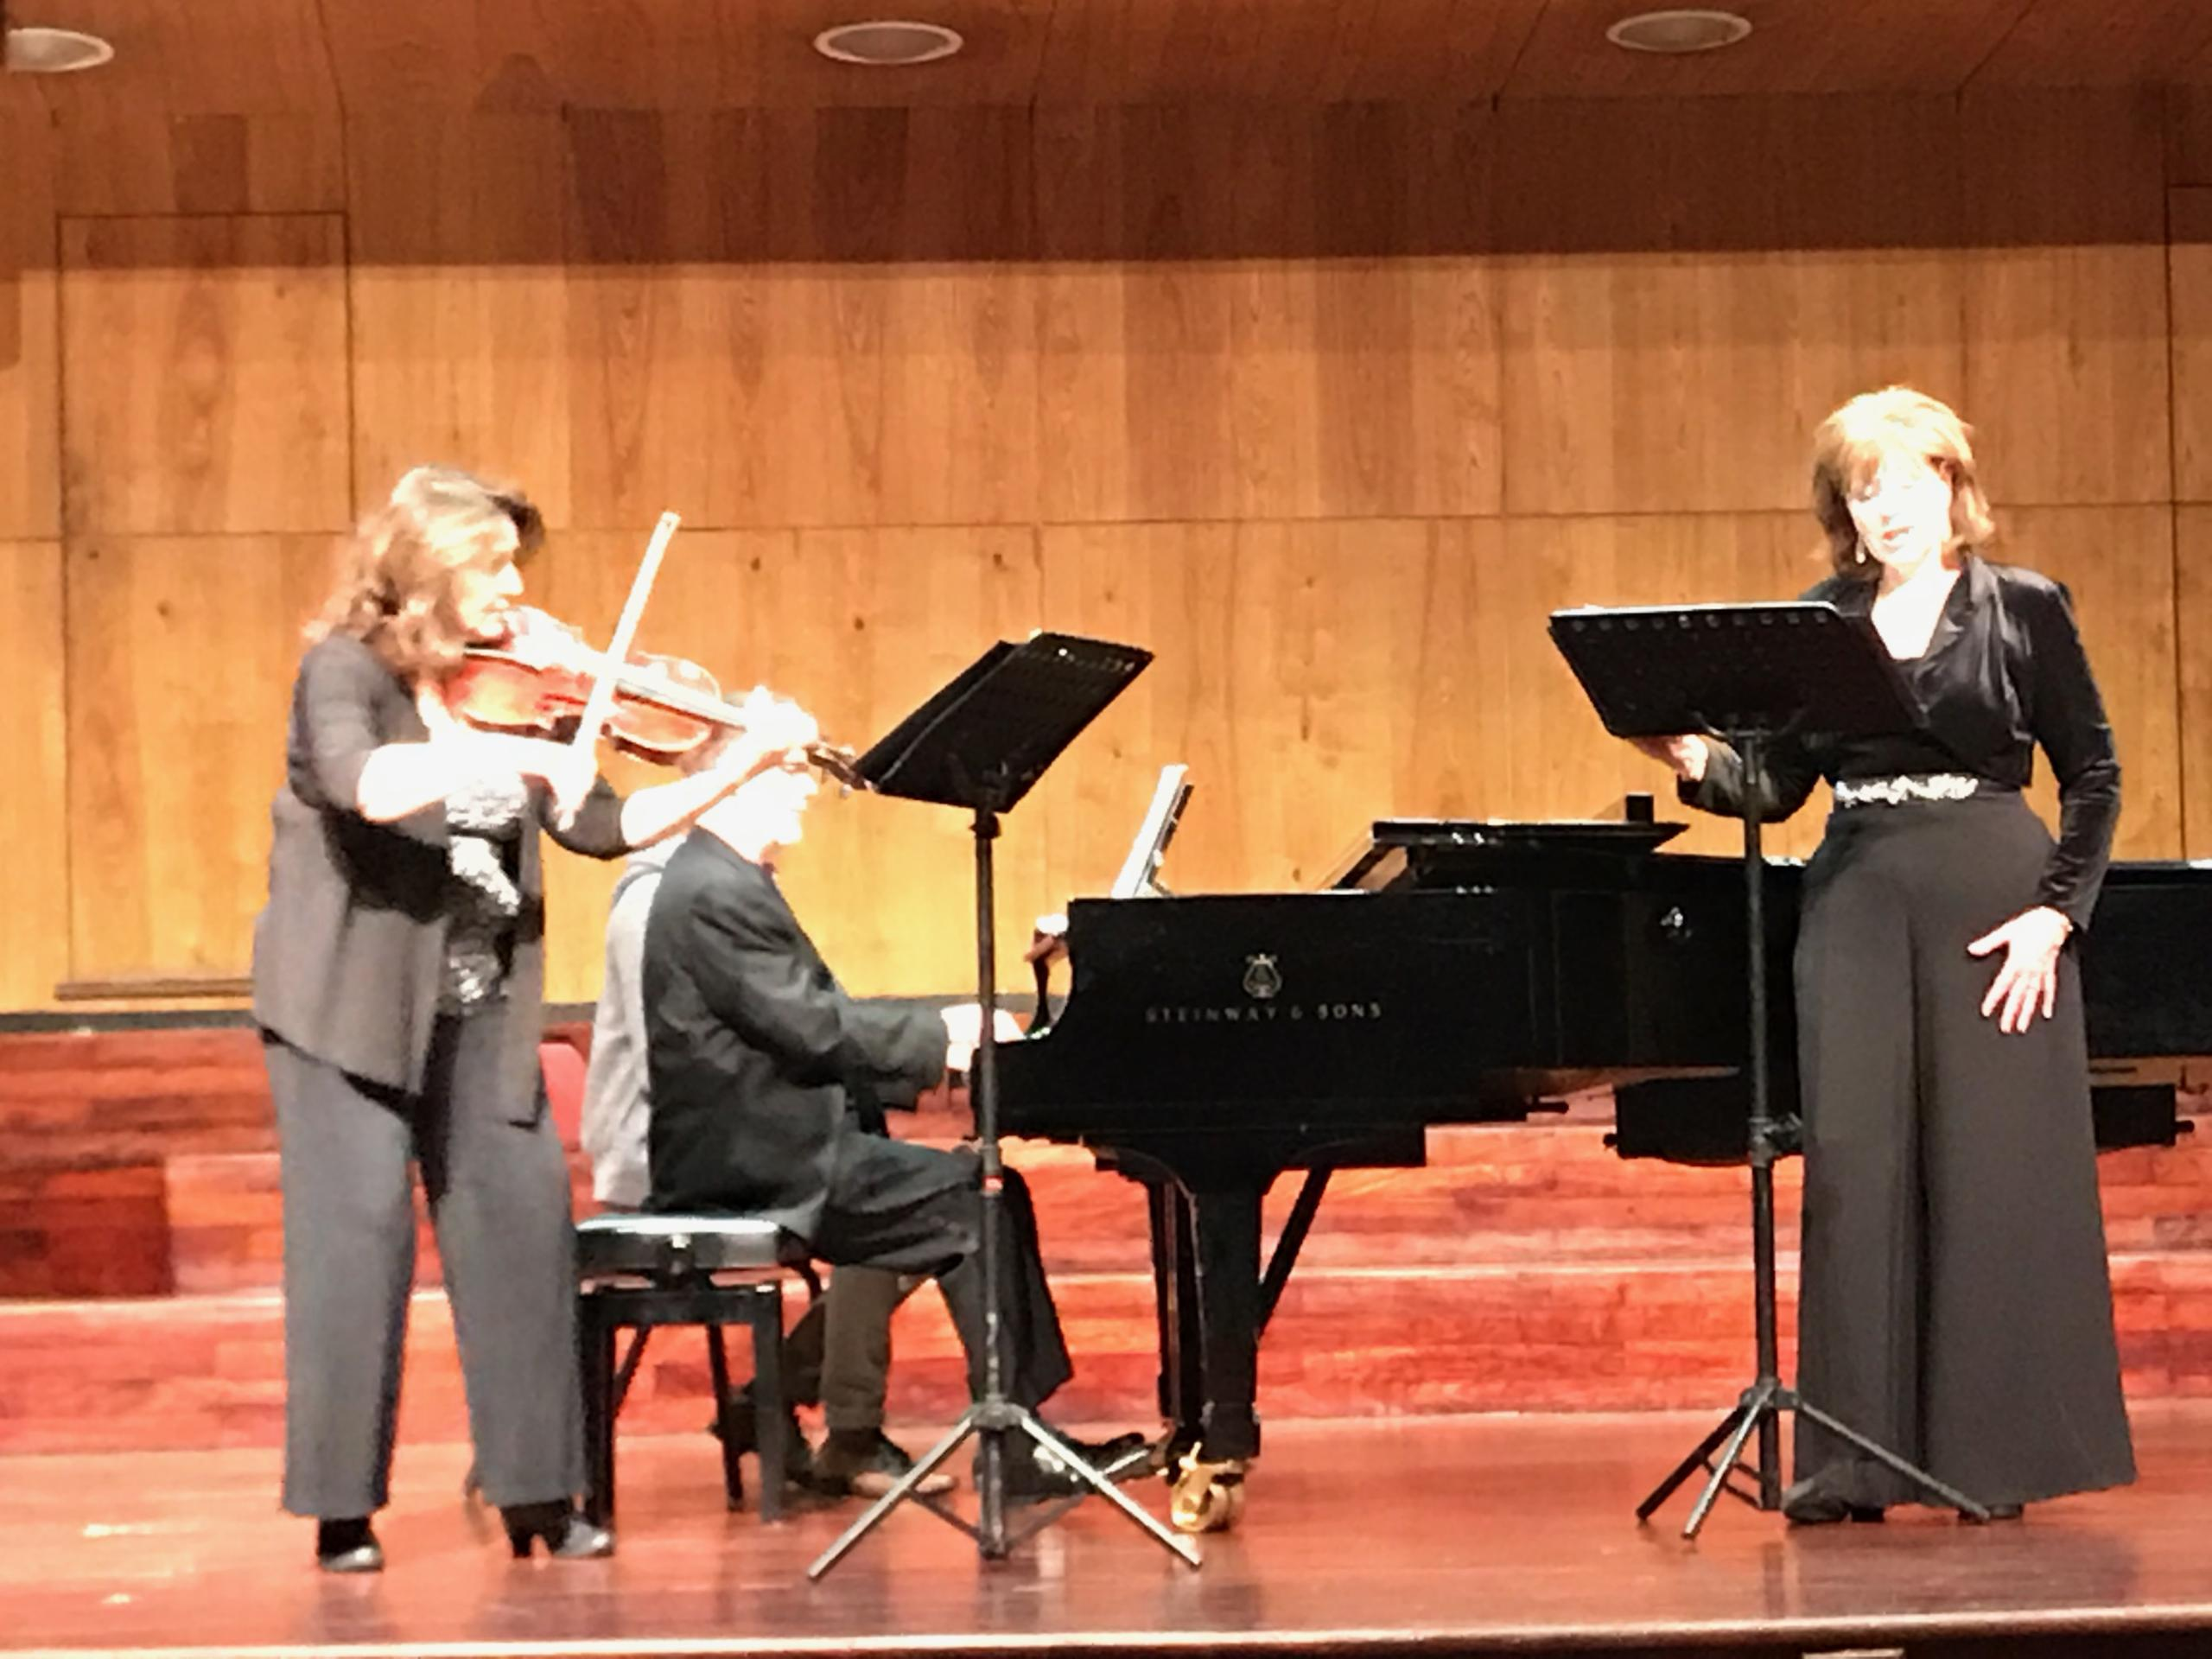 Festival Recital, Ames Asbell, viola and Joey Martin, piano